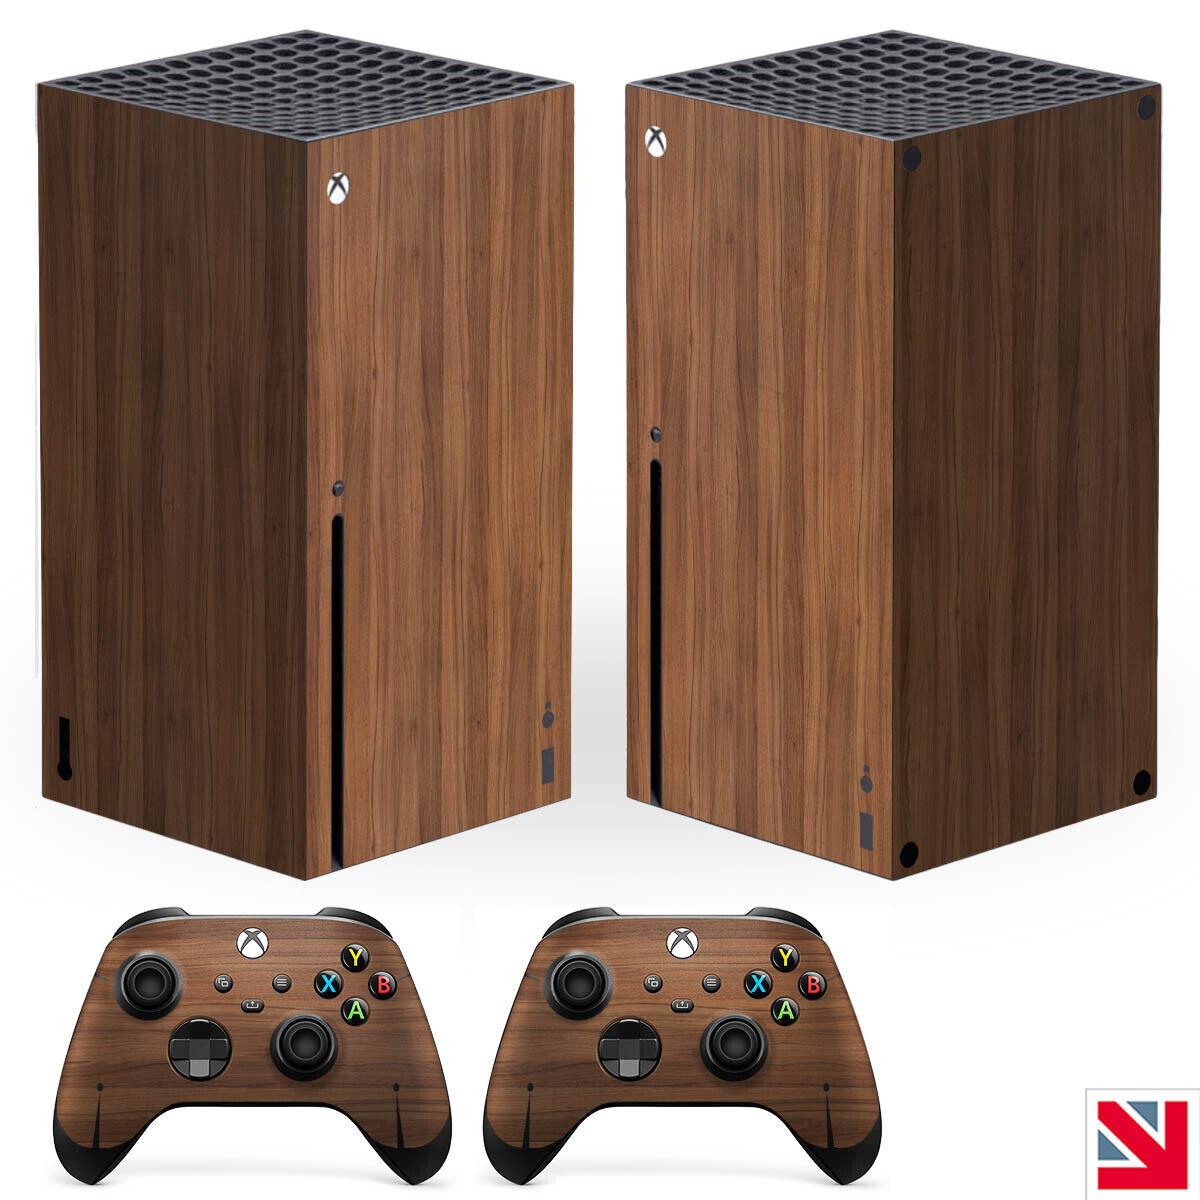 Wood Effect Wooden Style XBOX SERIES X Skin Decal Vinyl Sticker Wrap